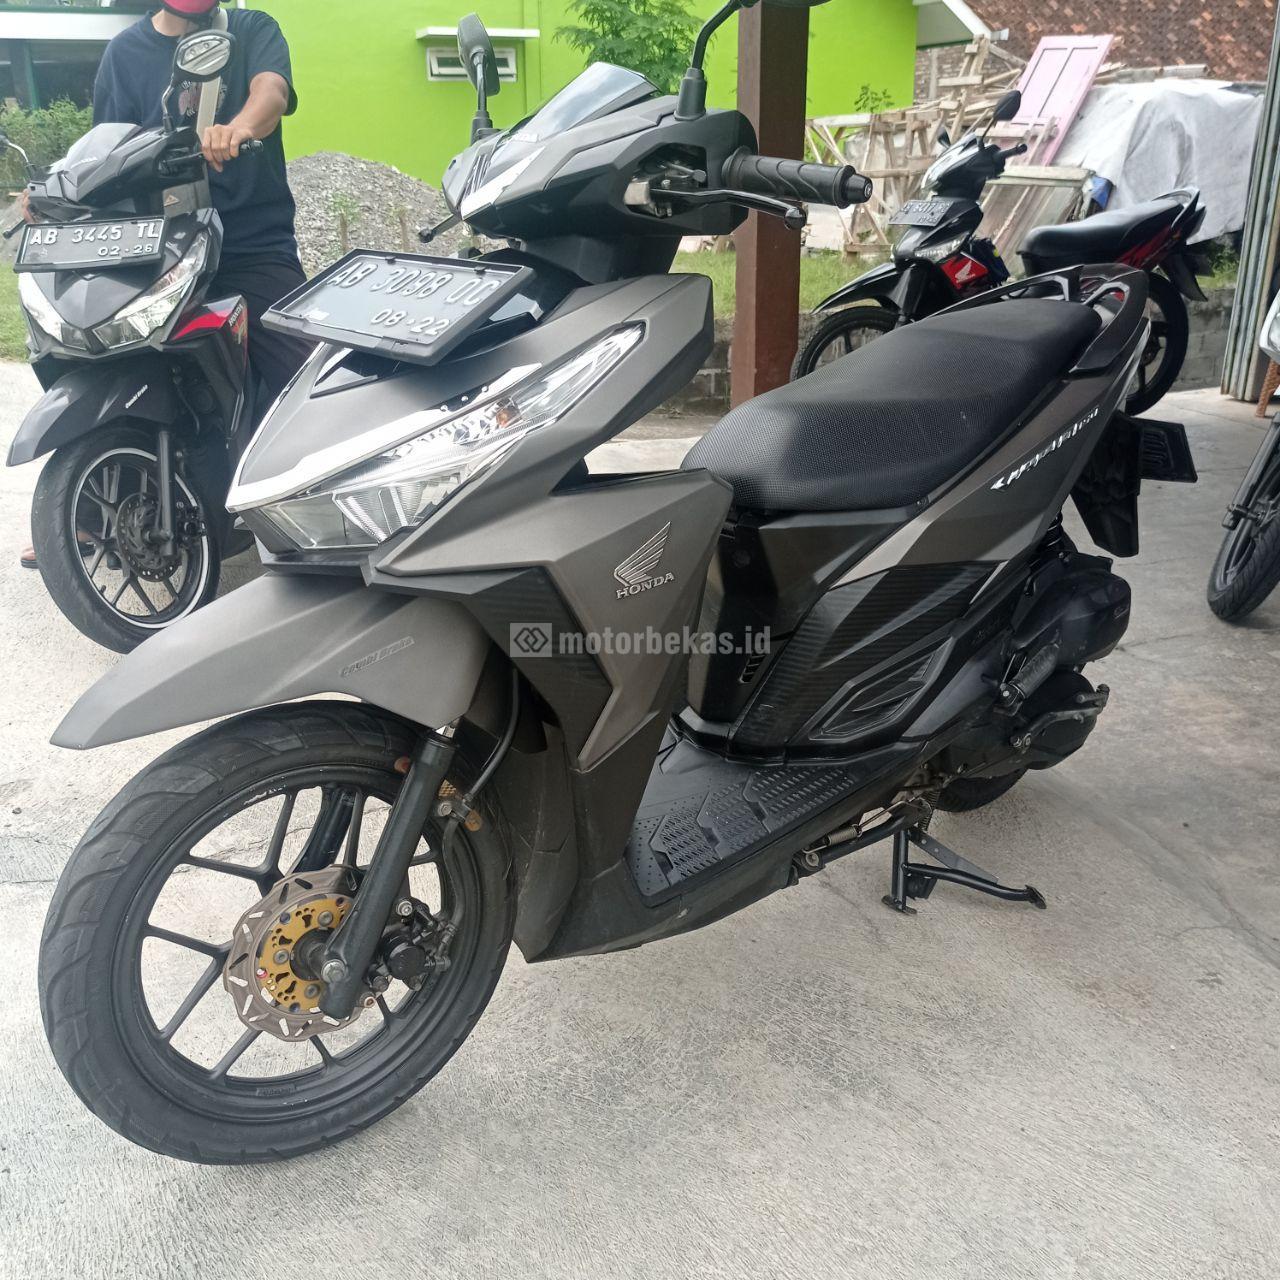 HONDA VARIO 150  2017 motorbekas.id